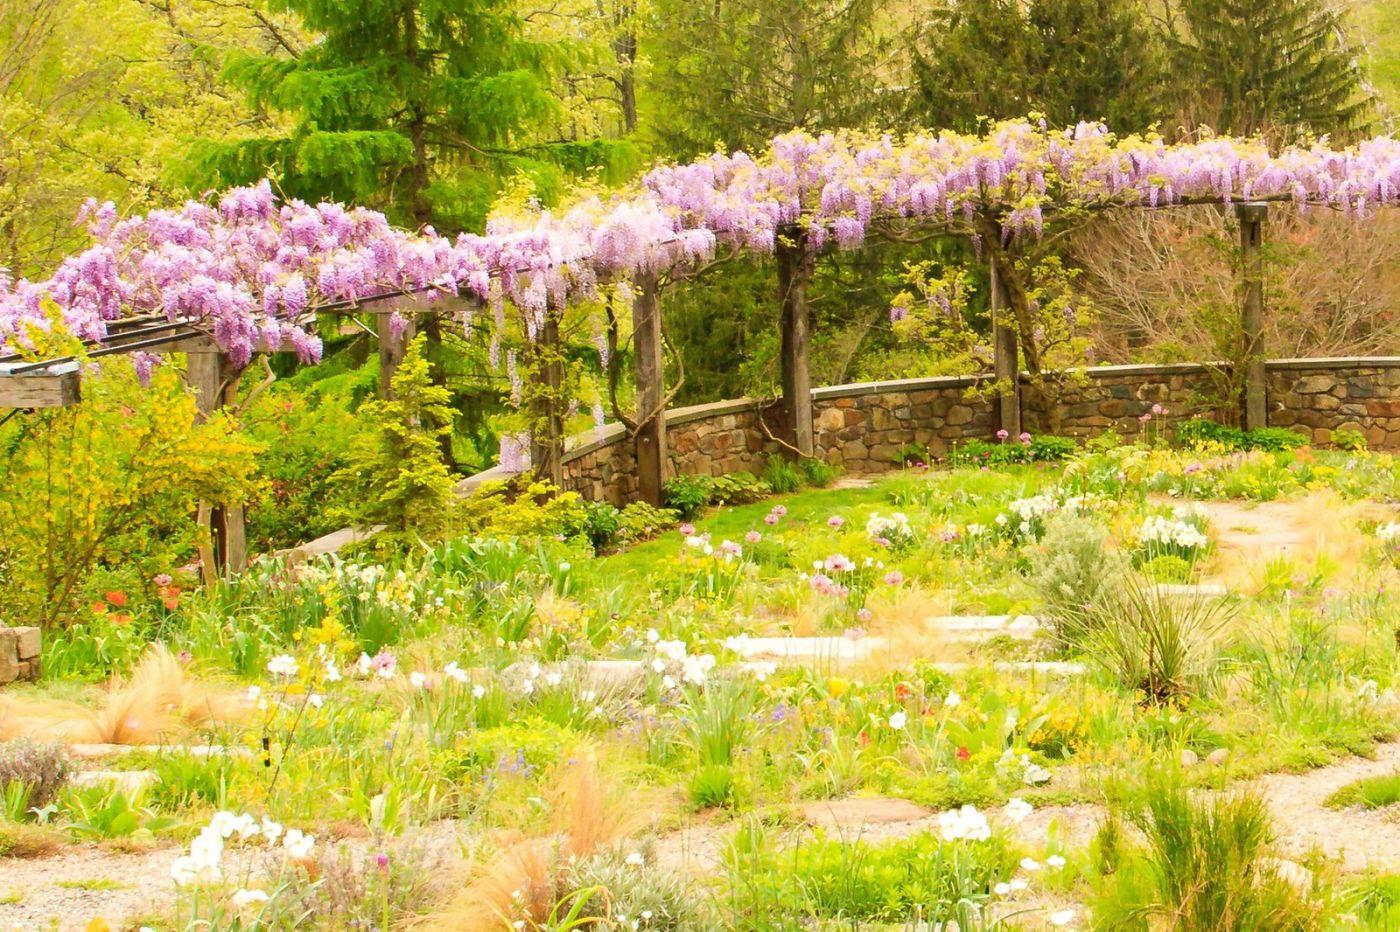 Chanticleer花园,那年盛开的紫藤花_图1-38